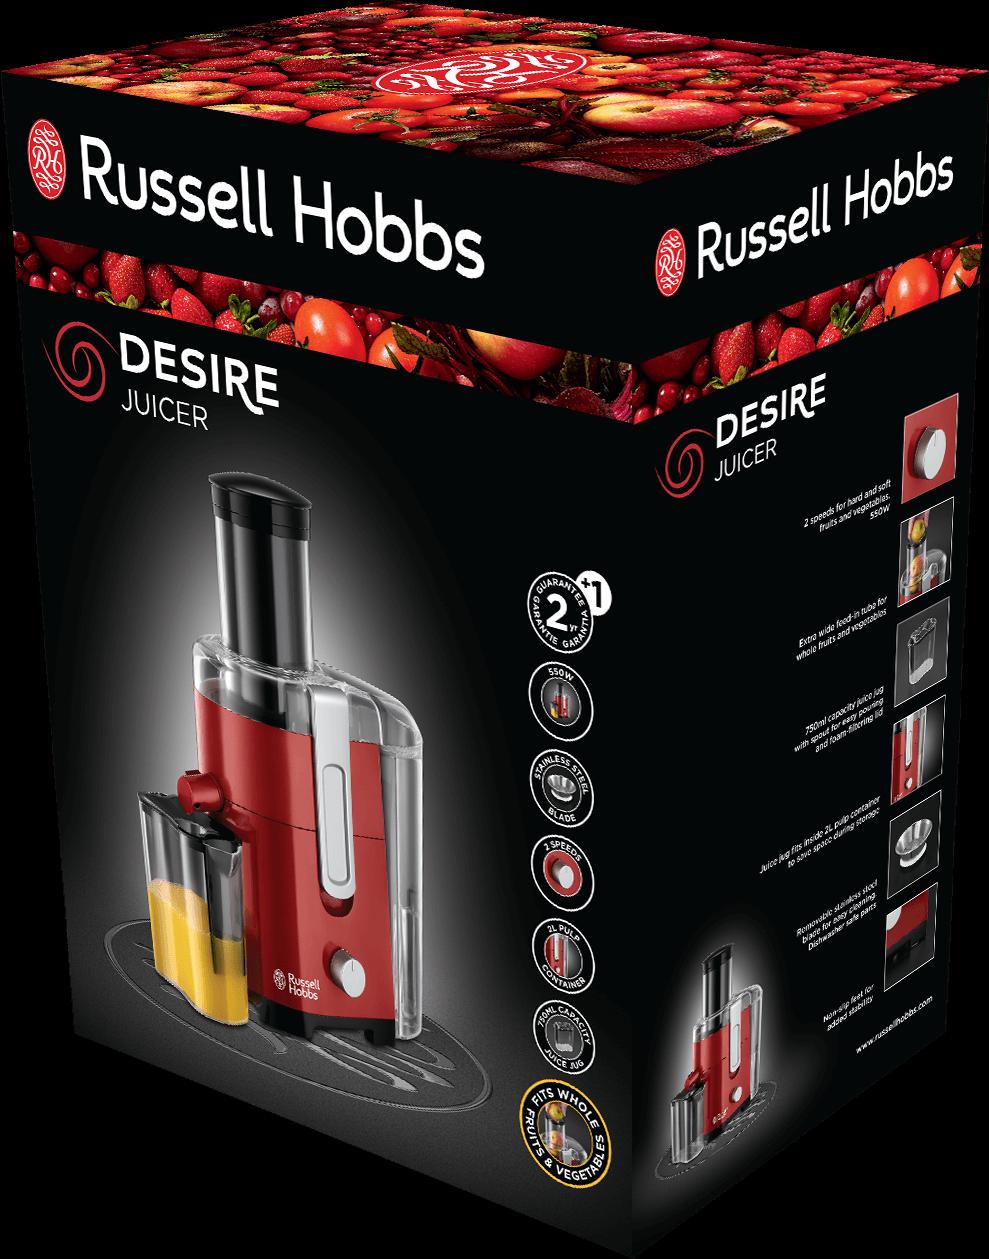 Sokowirówka Russell Hobbs  Desire 24740-56